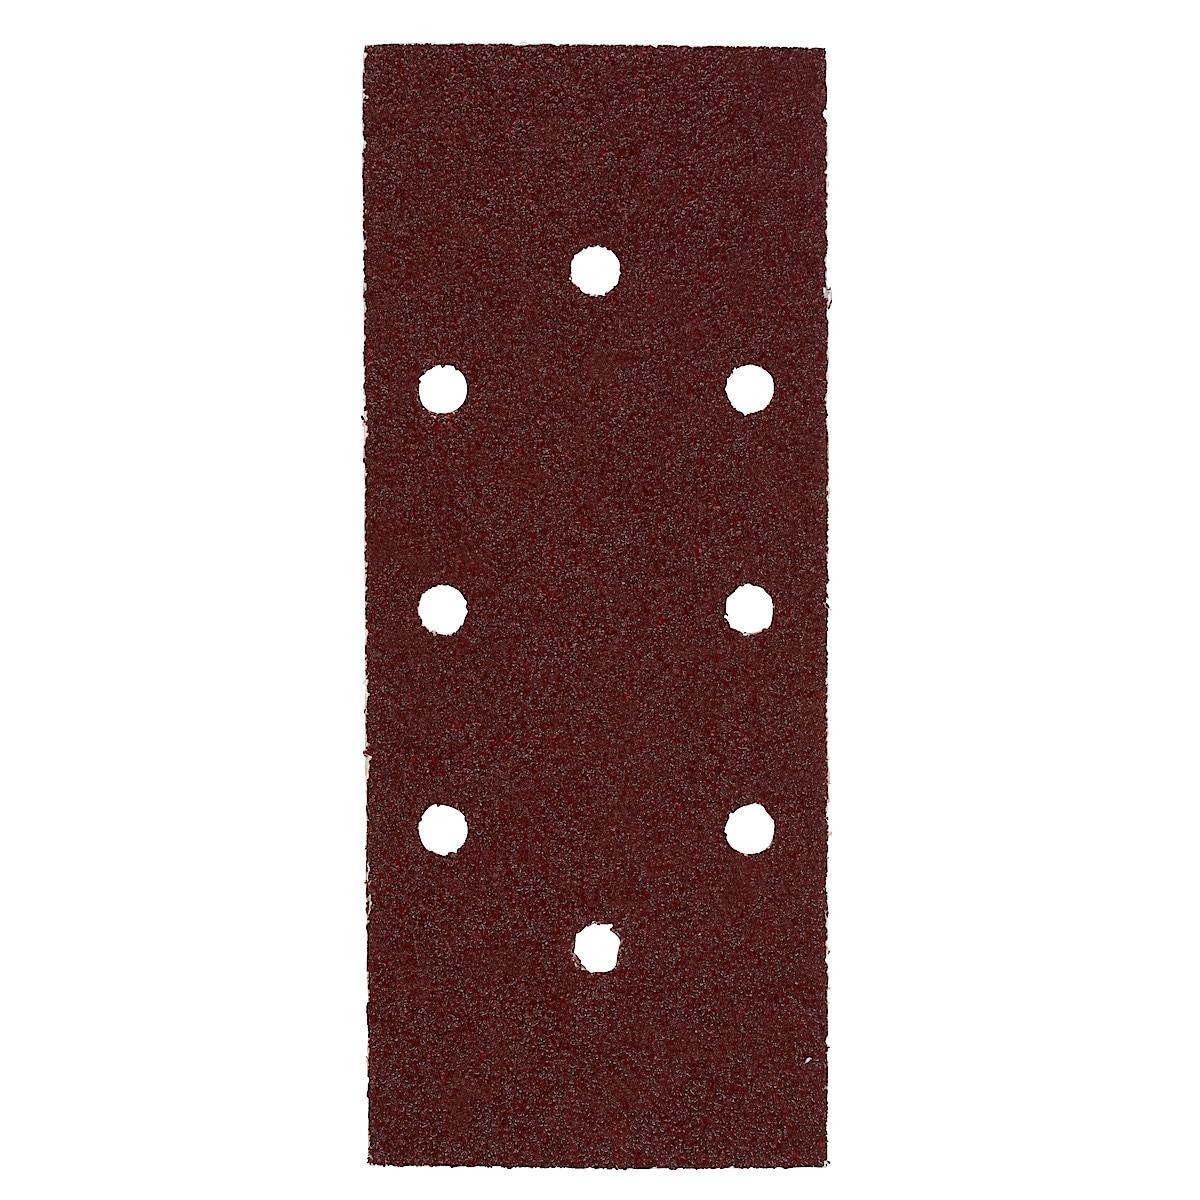 Cocraft slipepapir 93x230 mm